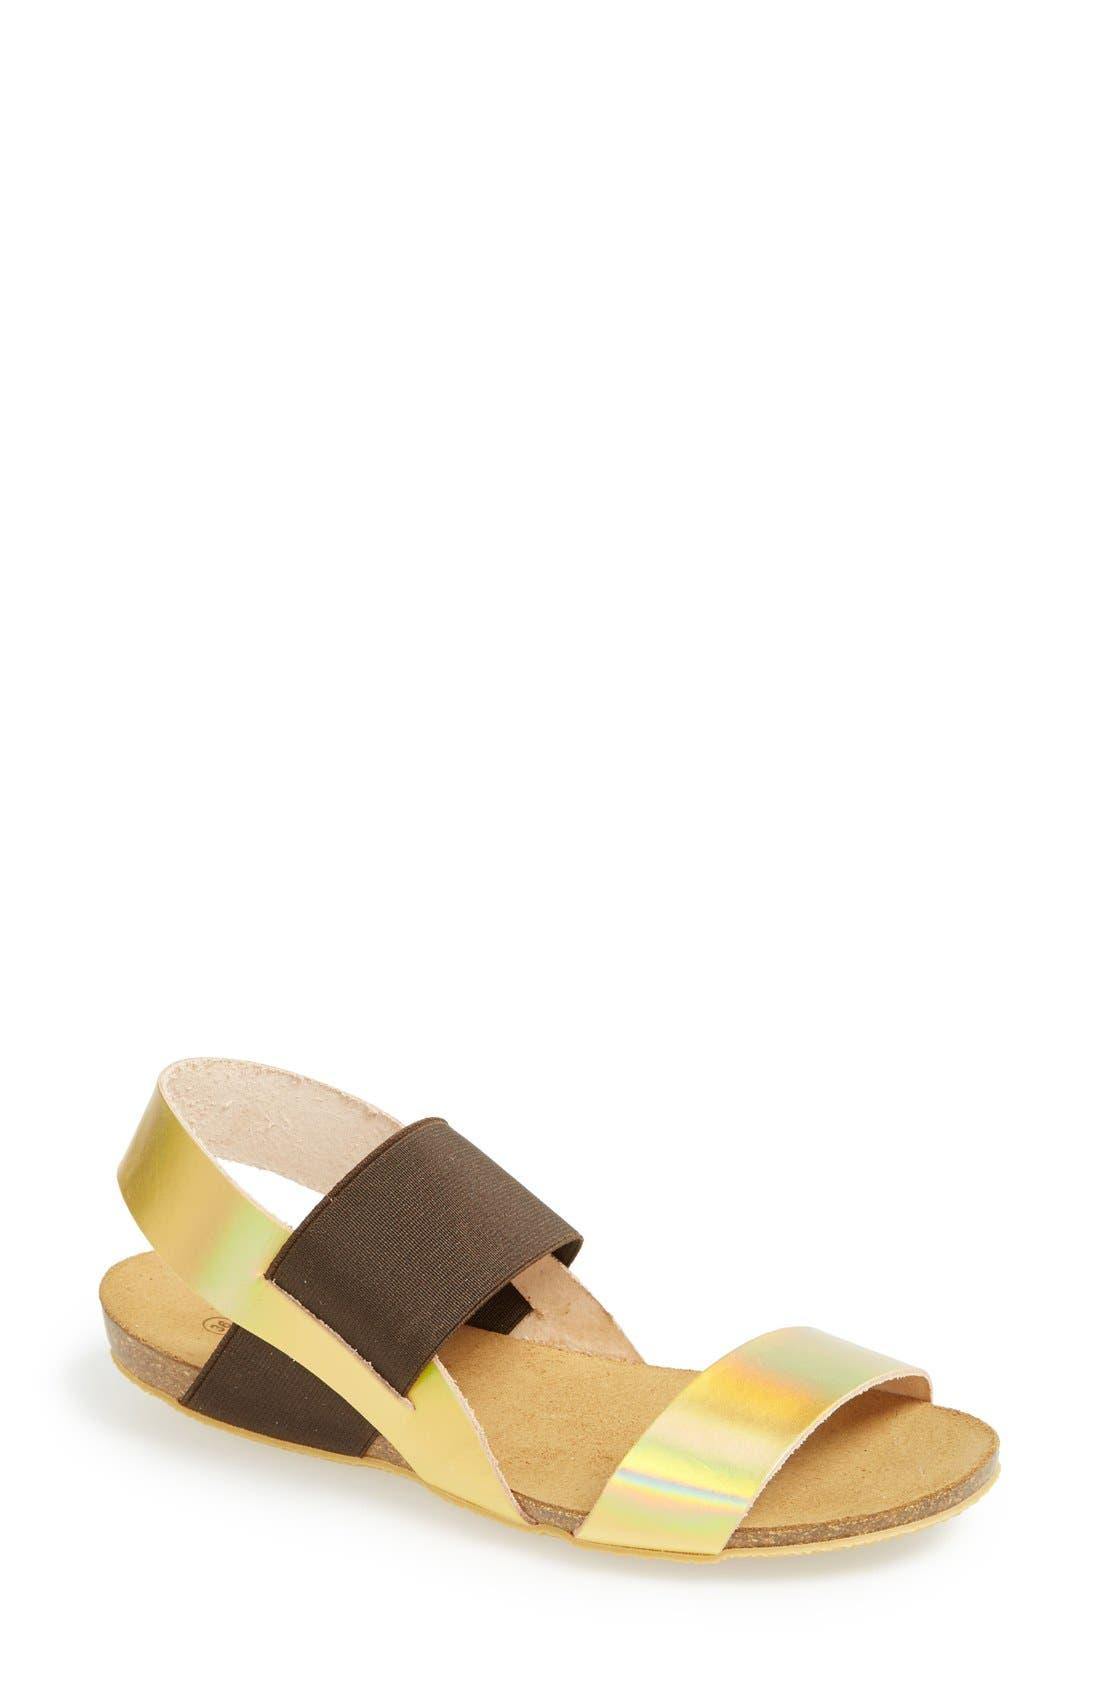 Main Image - MTNG Originals 'Annie' Colorblock Sandal